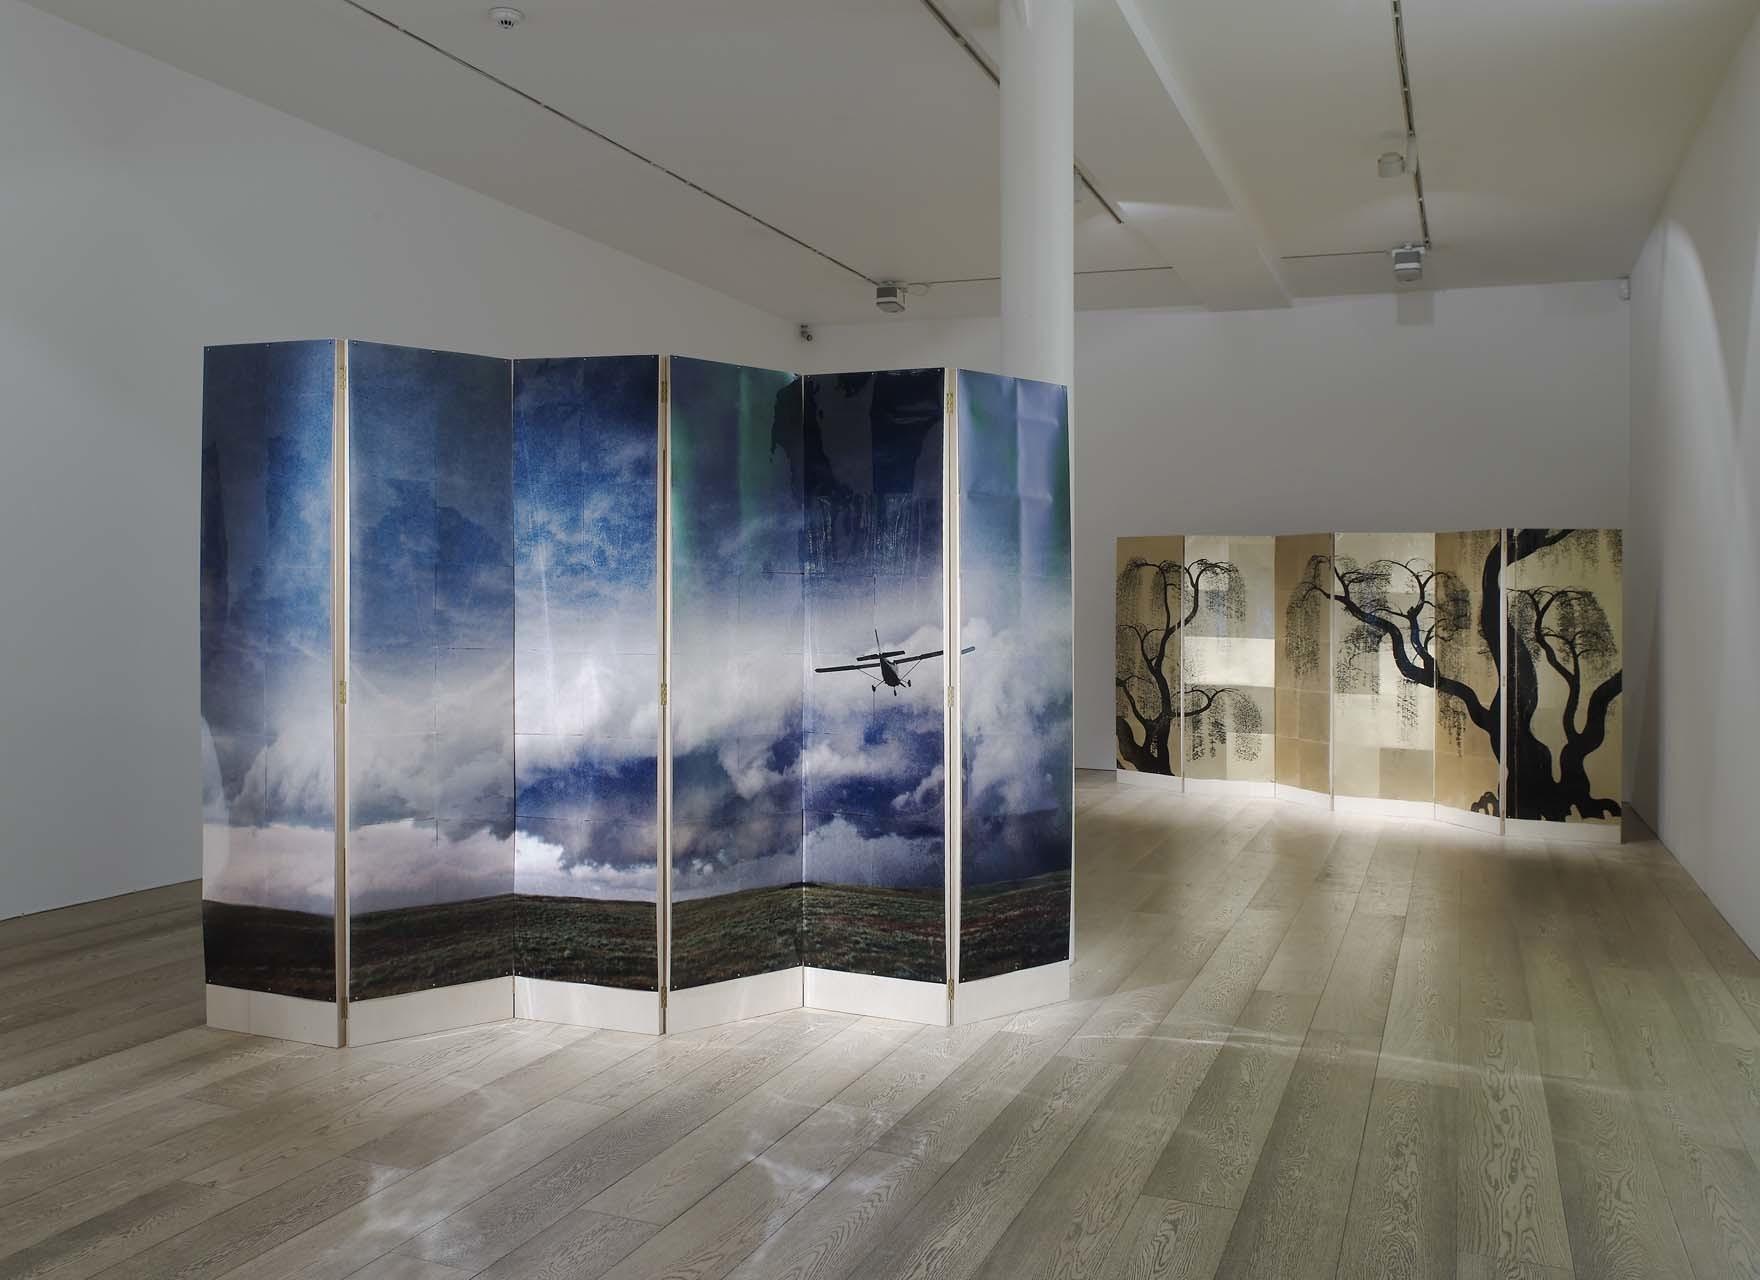 "<div class=""artwork_caption""><p>Installation View, Yours, Patsy Cline, 2010</p></div>"